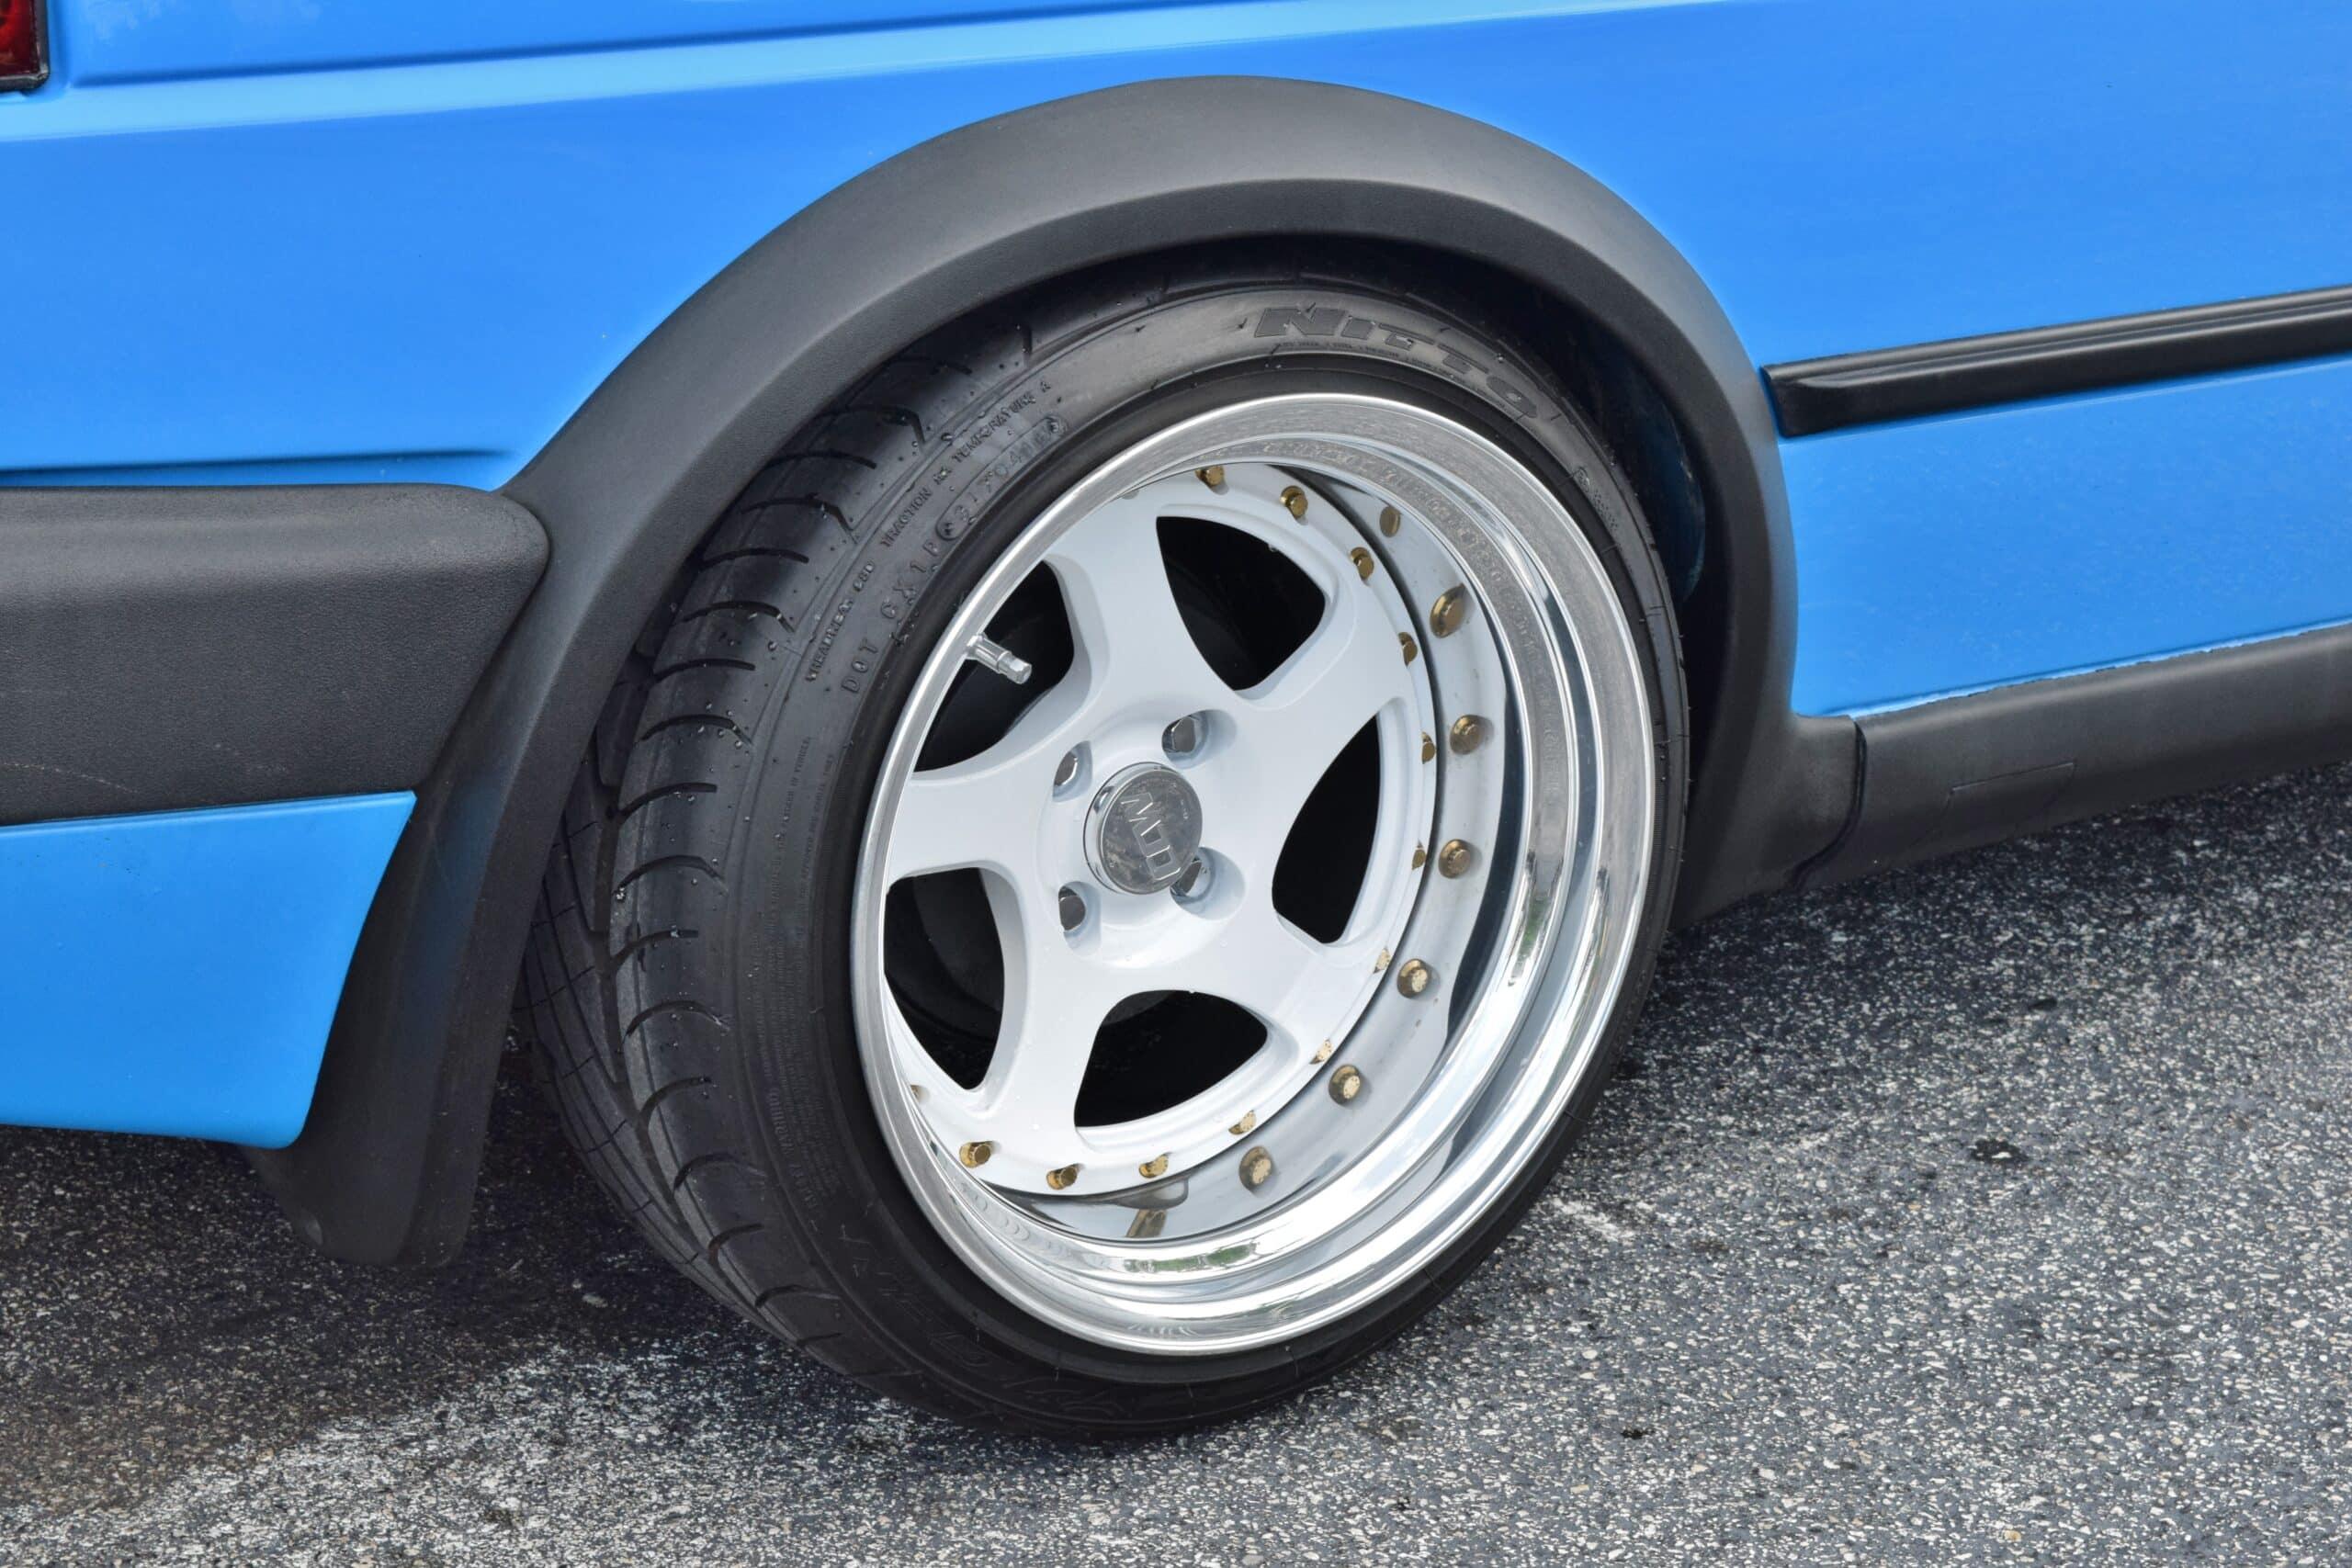 1992 Volkswagen Golf MK2 GTI VR6 SWAP Voodoo Blue Custom Paint-Airlift Suspension-CCW Wheels-Custom Interior-SHOW CAR